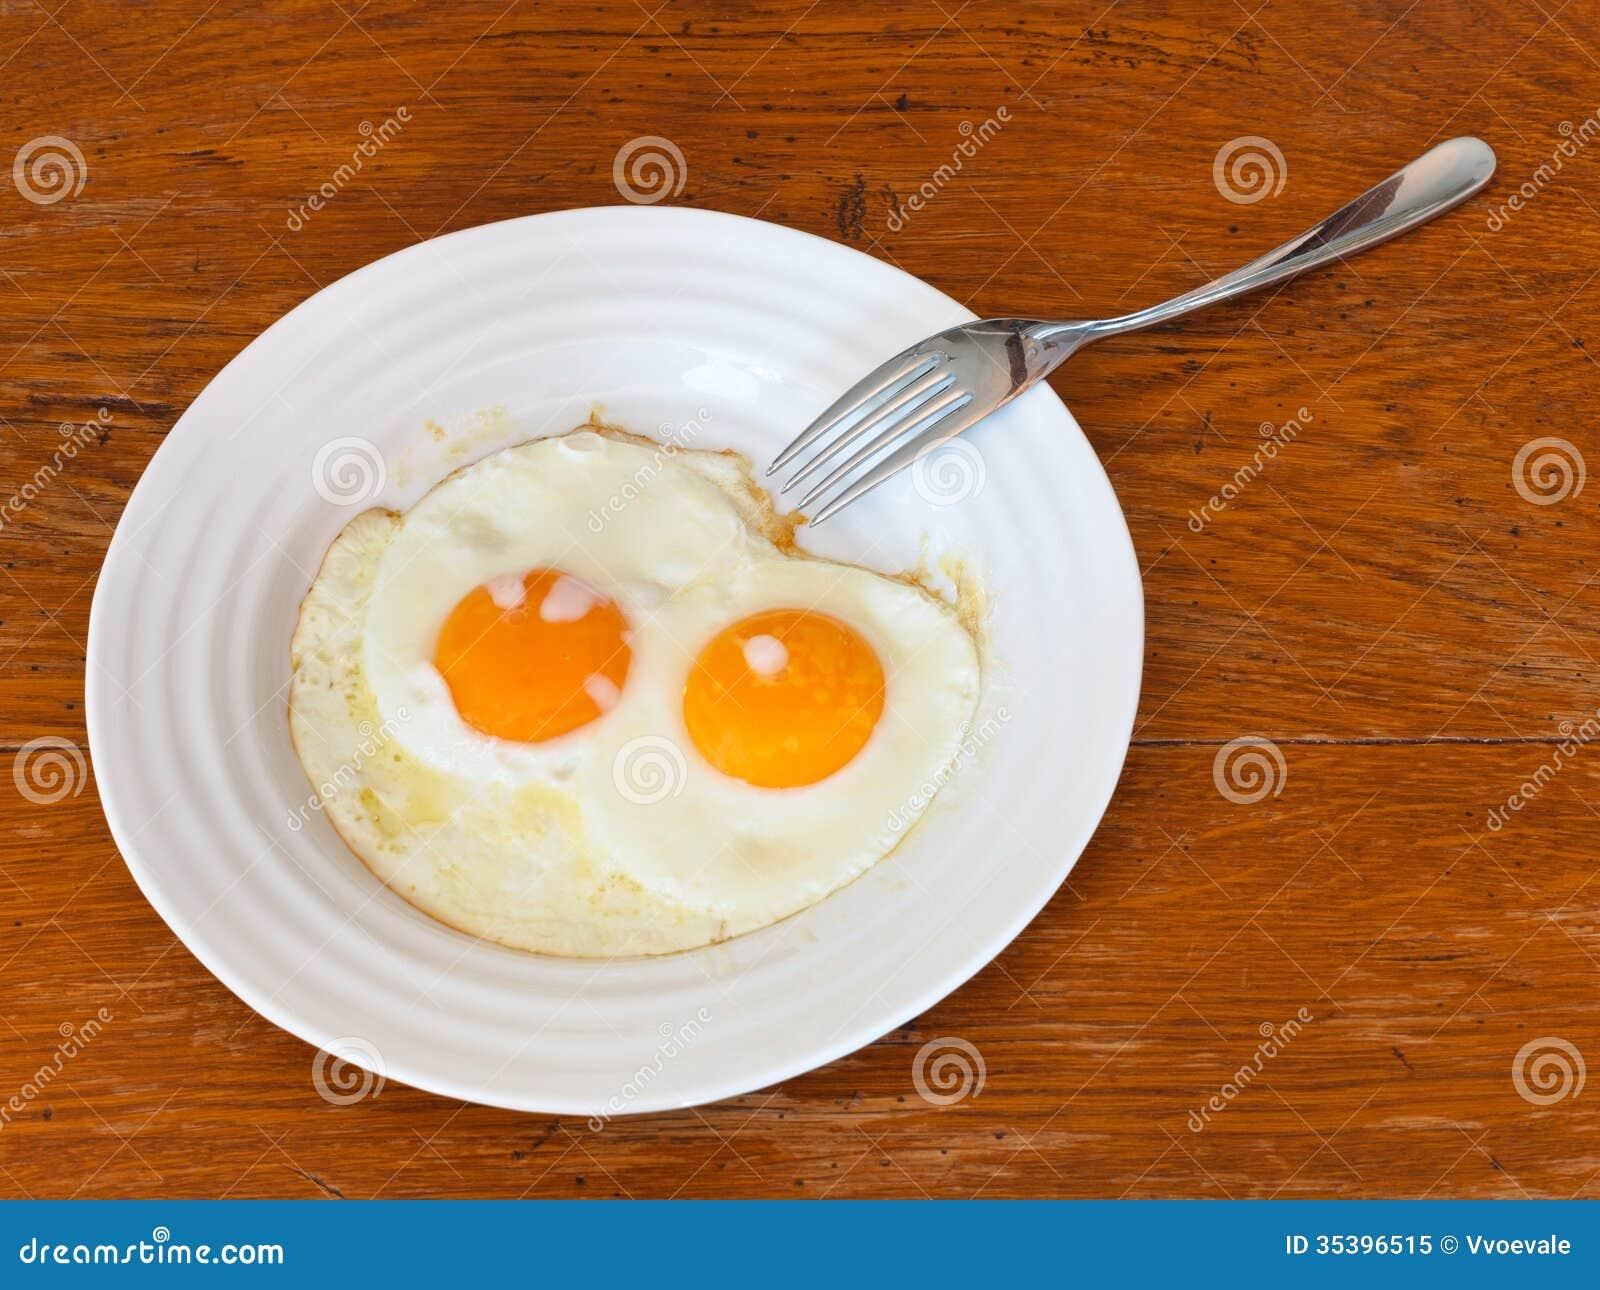 Fried eggs on a plate  |Fried Eggs On A Plate